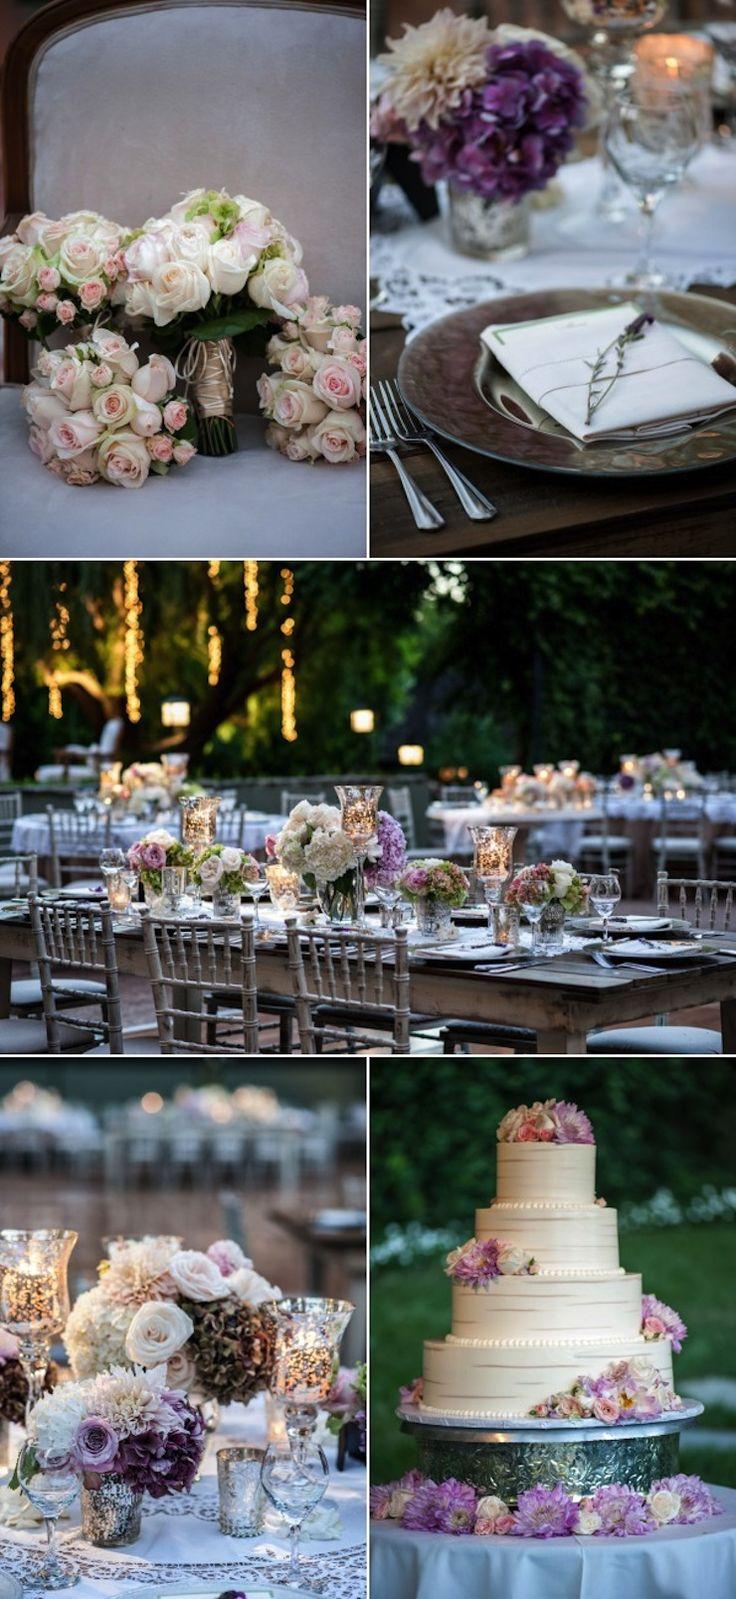 A Sweet and Elegant Backyard Wedding | Encino, California - International Event Company